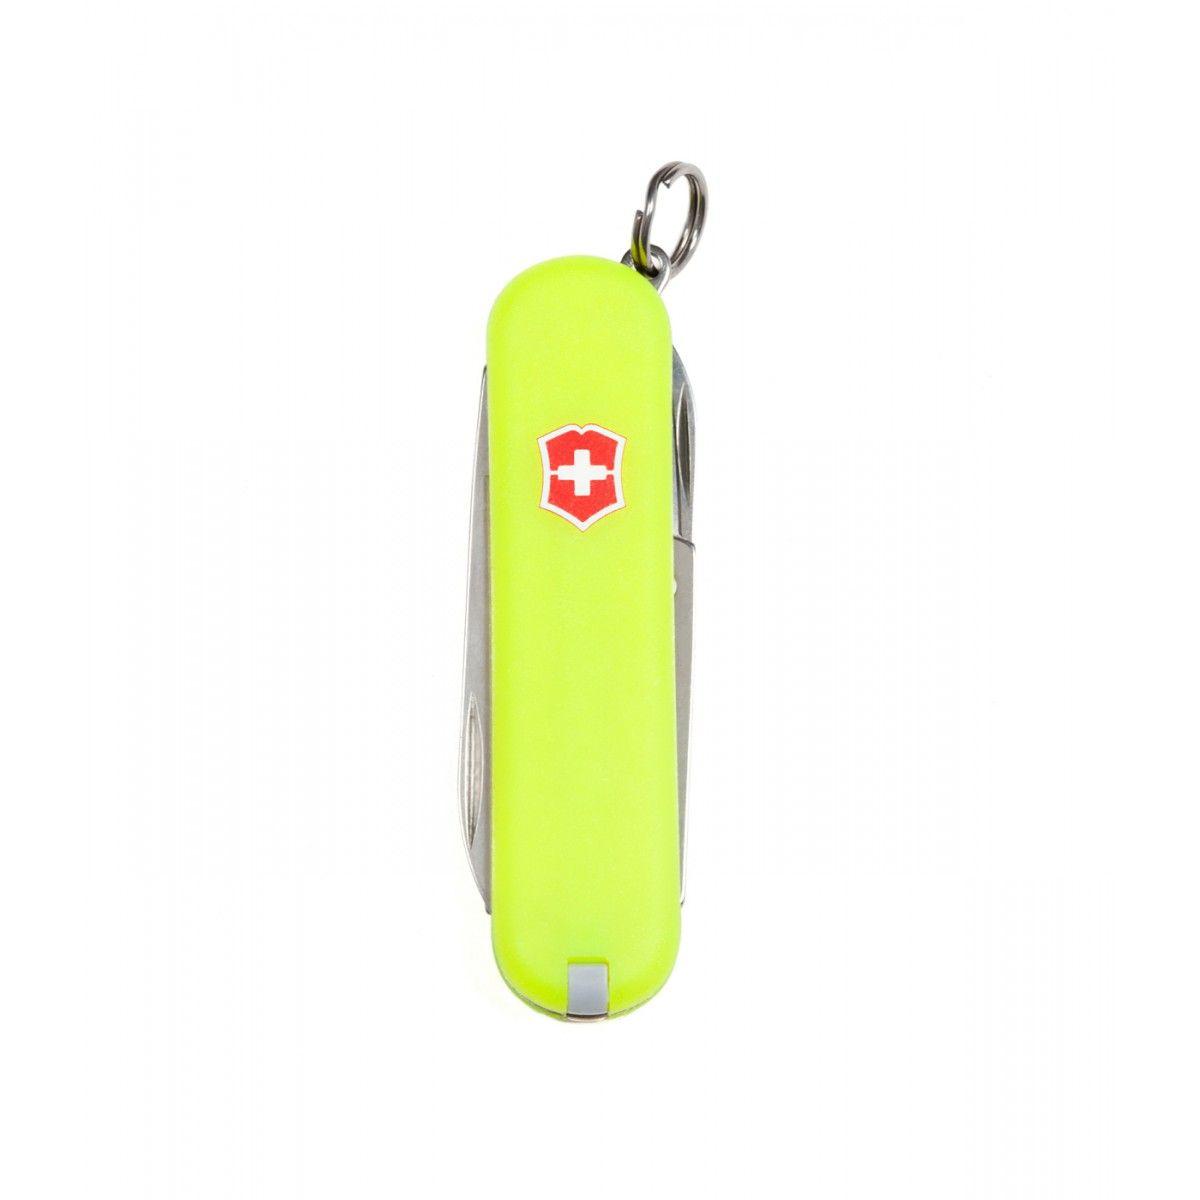 Glow In The Dark Neon Swiss Army Knife Yes Please 25